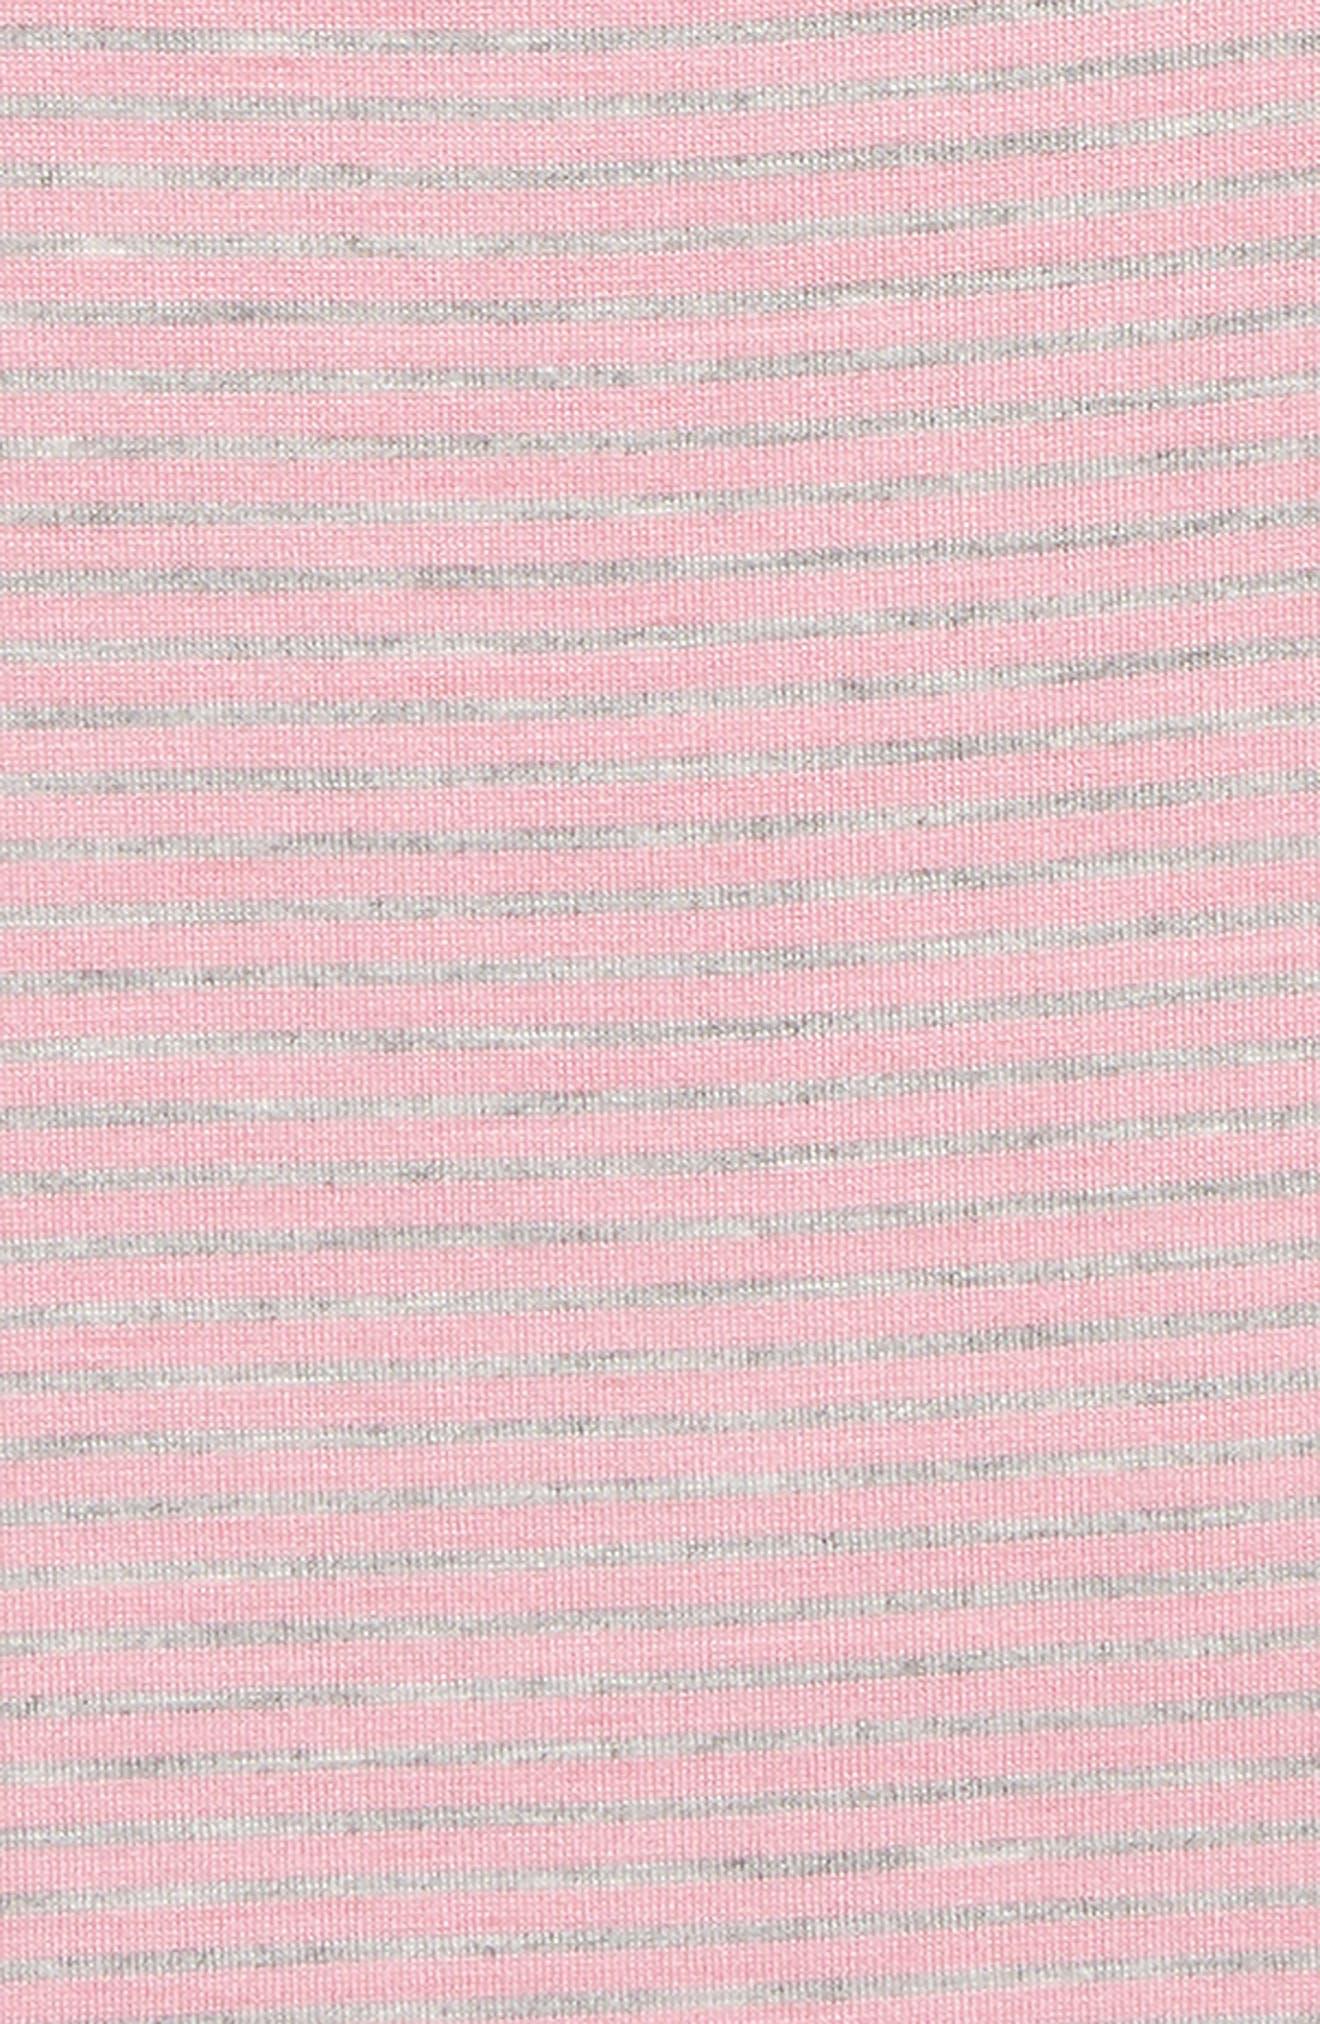 Asymmetrical Ruffle Tank,                             Alternate thumbnail 2, color,                             Grey Ash Heather- Pink